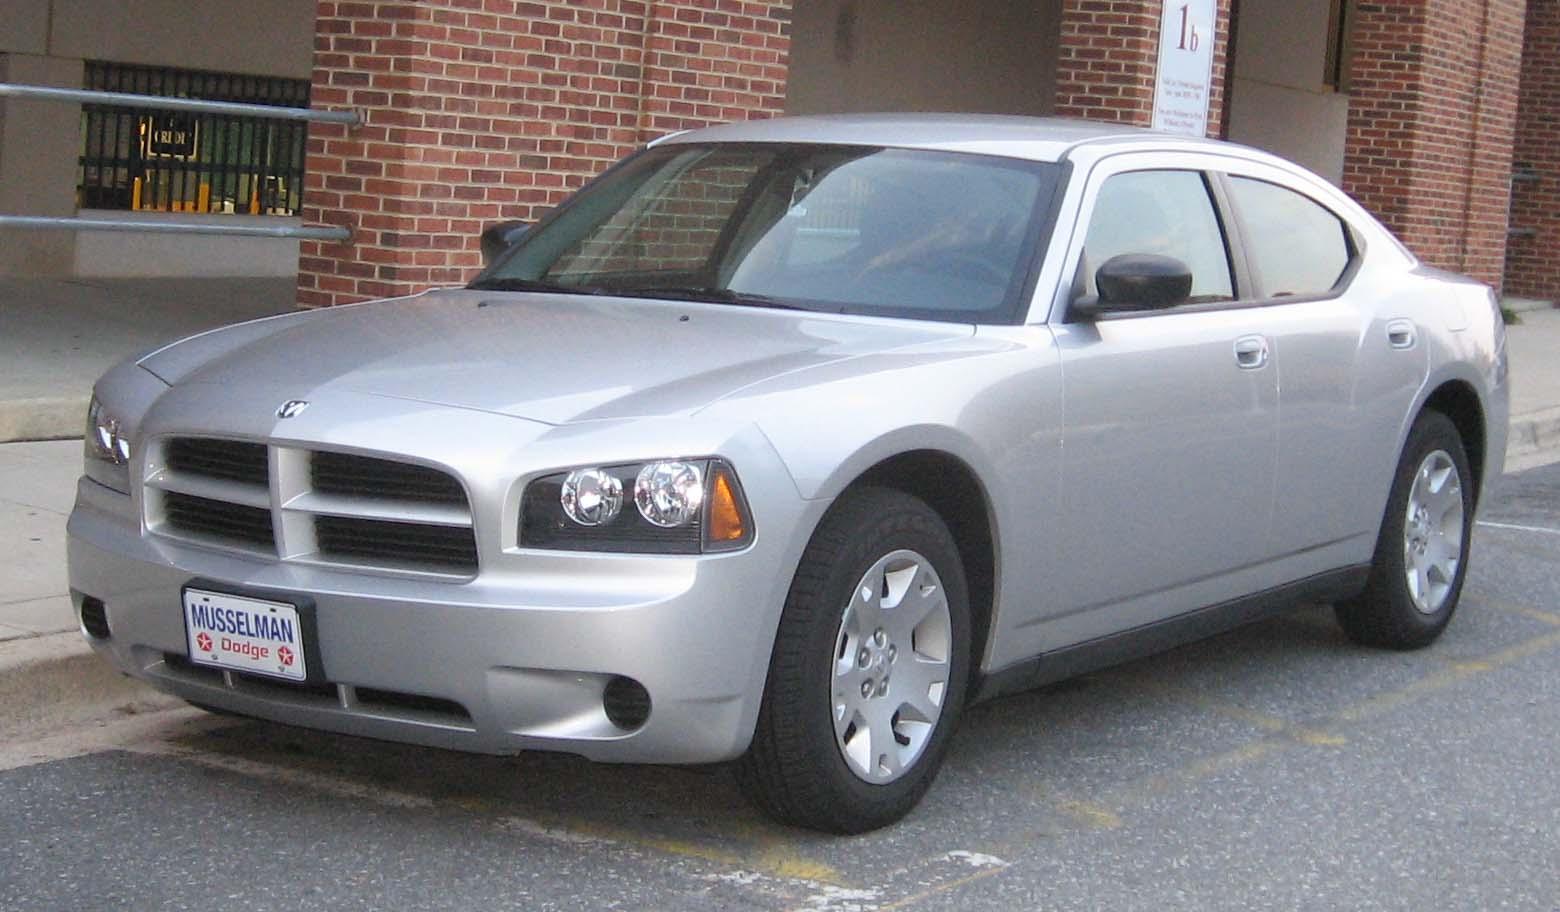 File:Dodge Charger SE JPG - Wikipedia